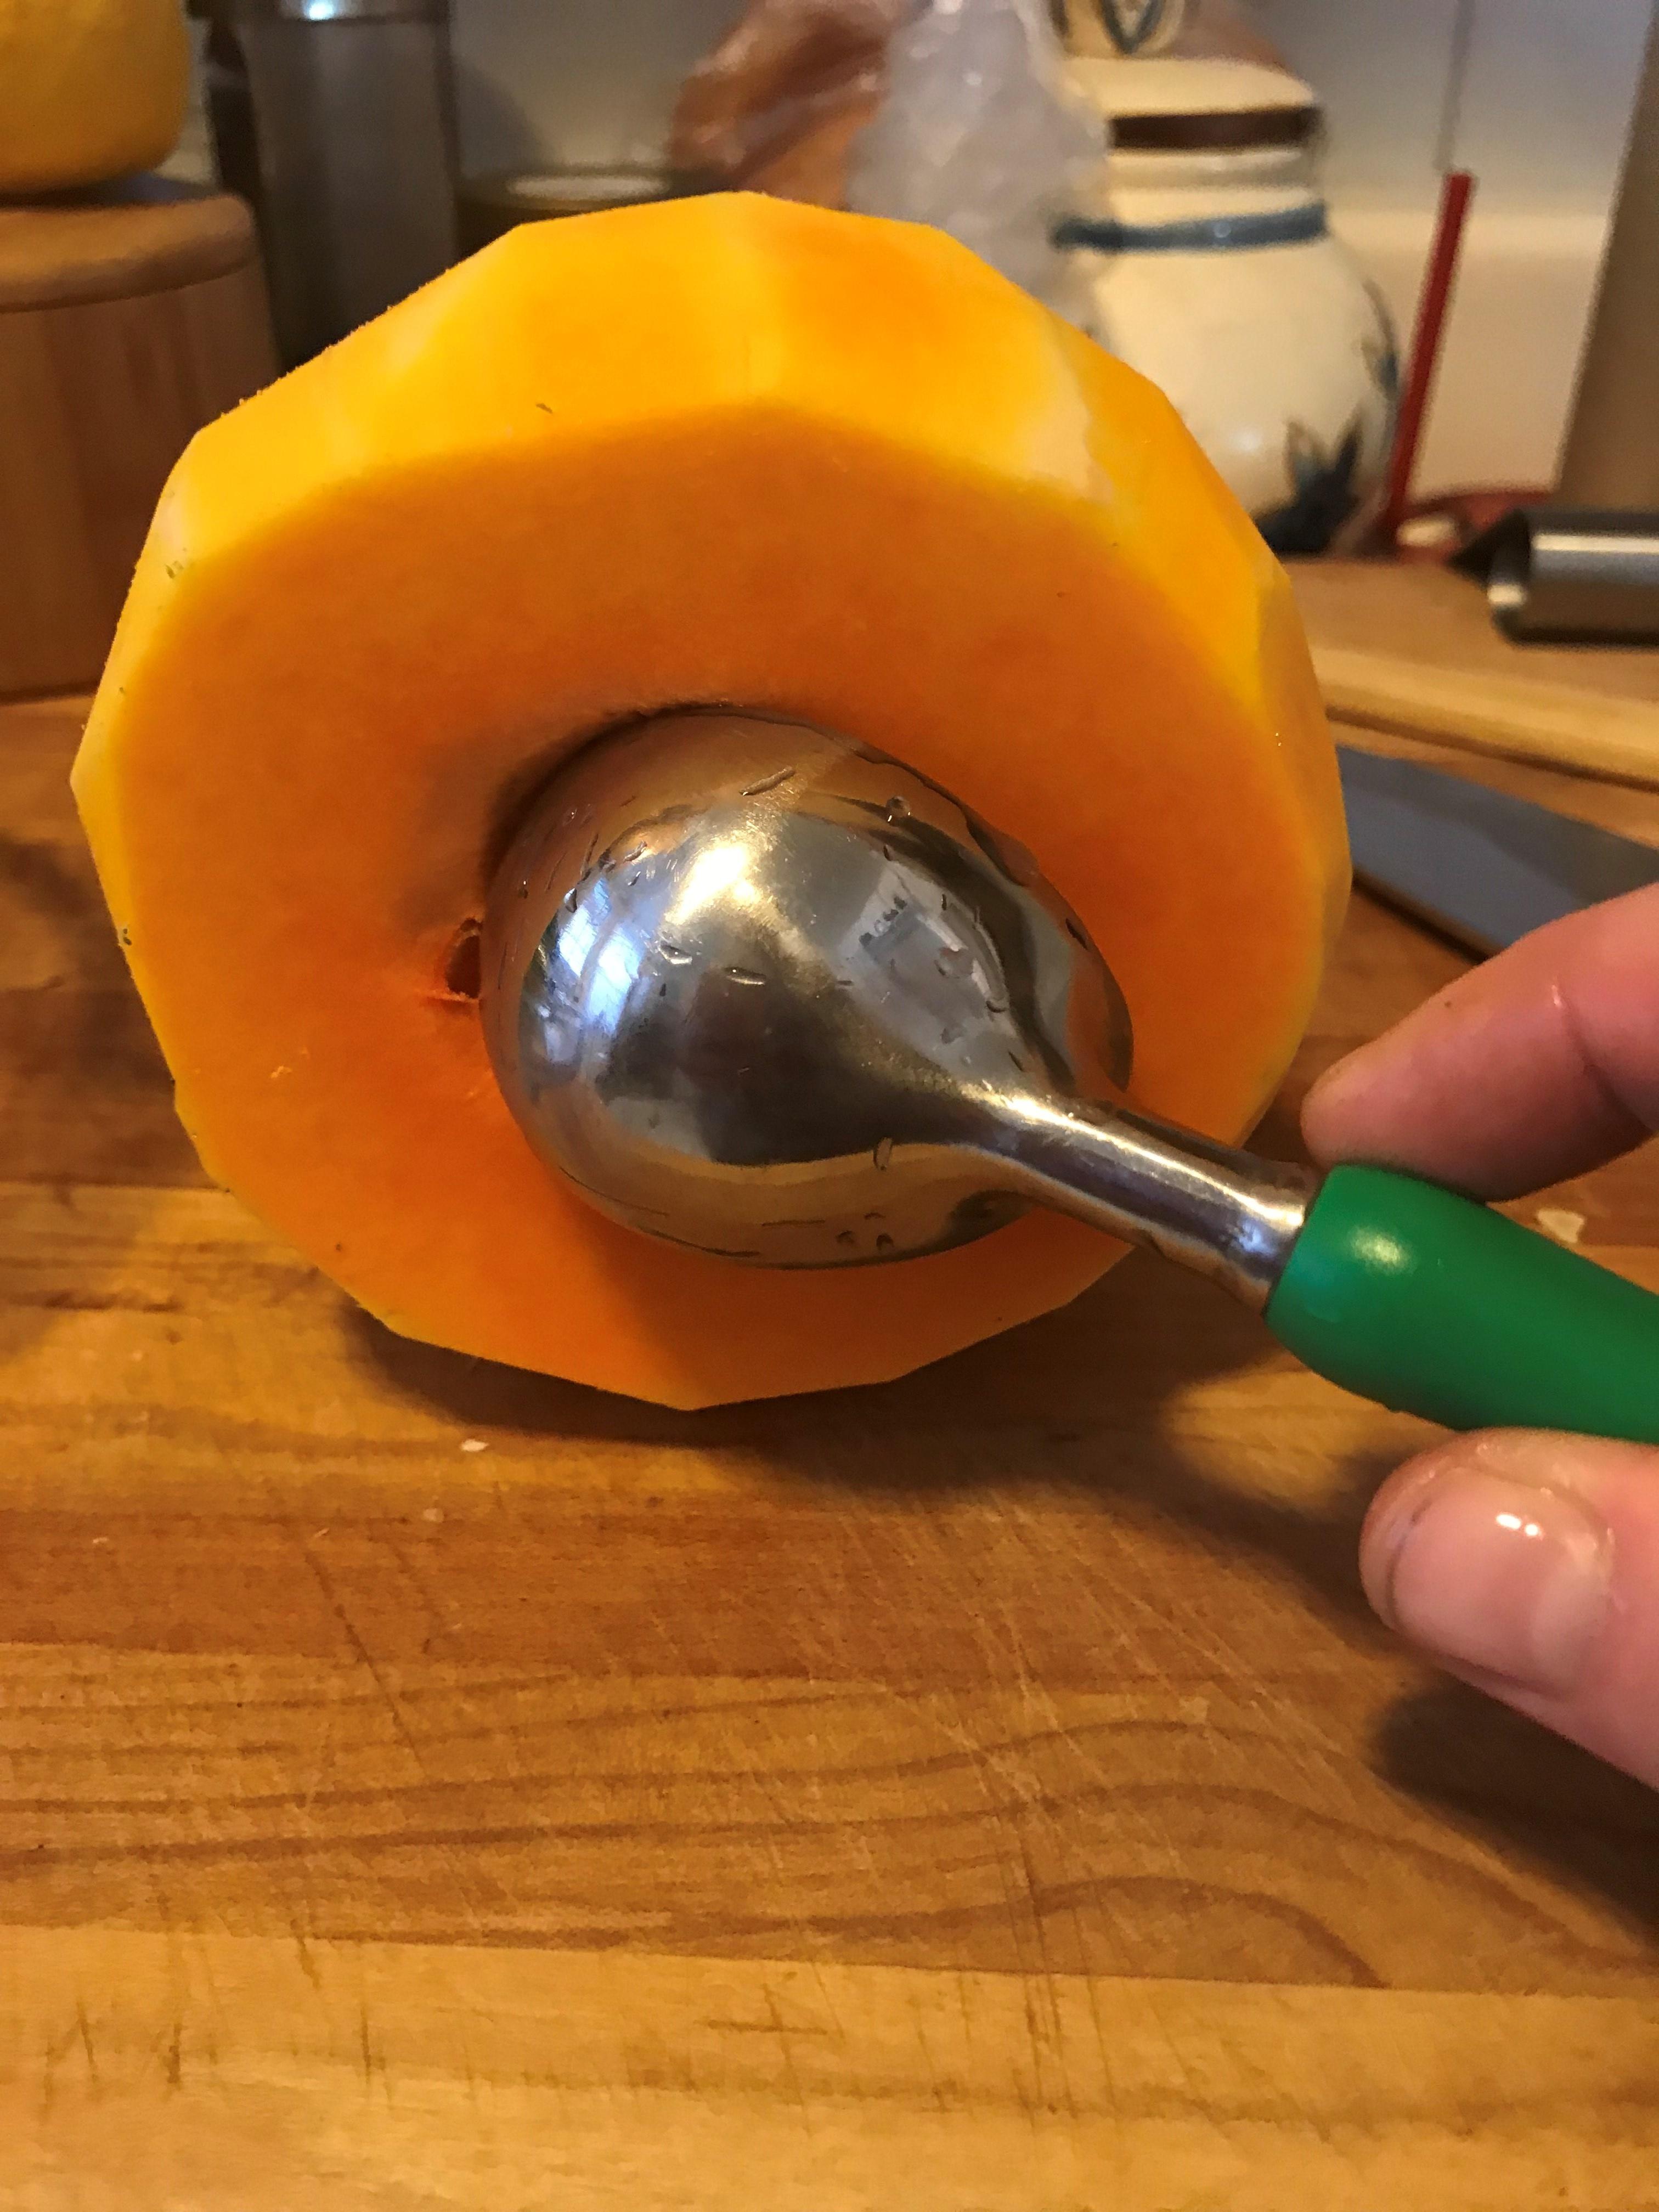 squash hollow